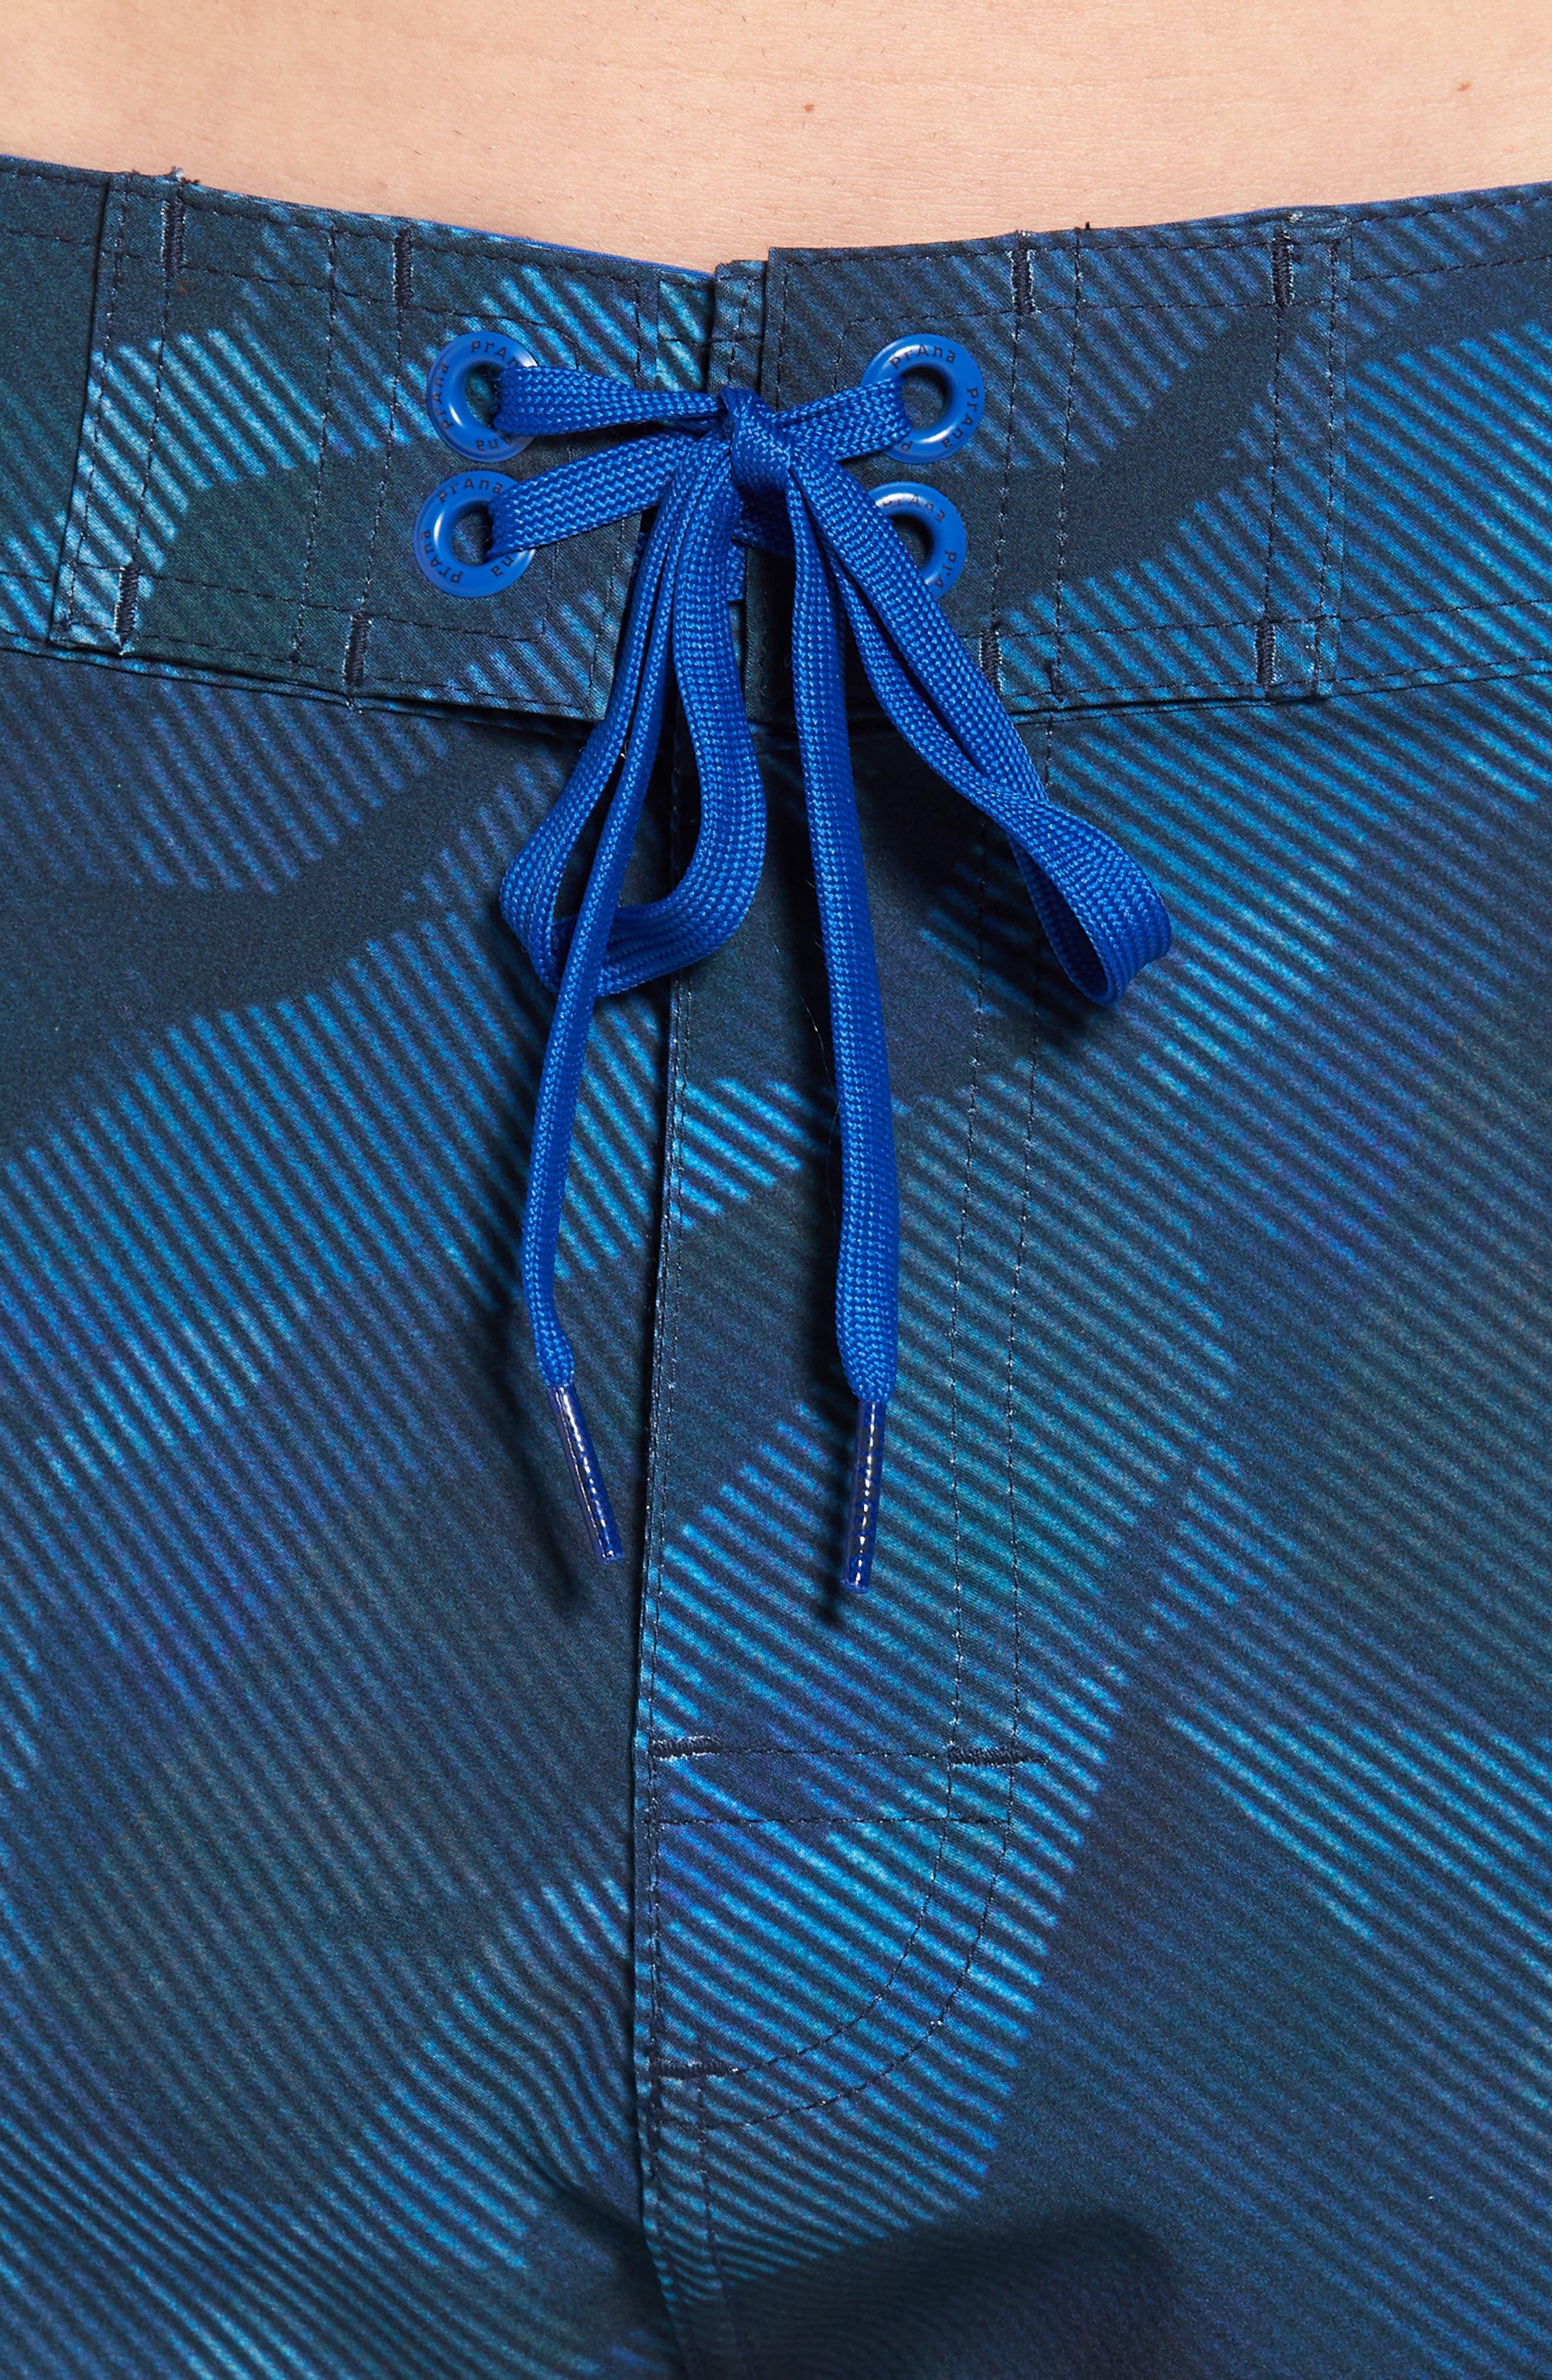 'Sediment' Stretch Board Shorts,                             Alternate thumbnail 4, color,                             Island Blue Hex